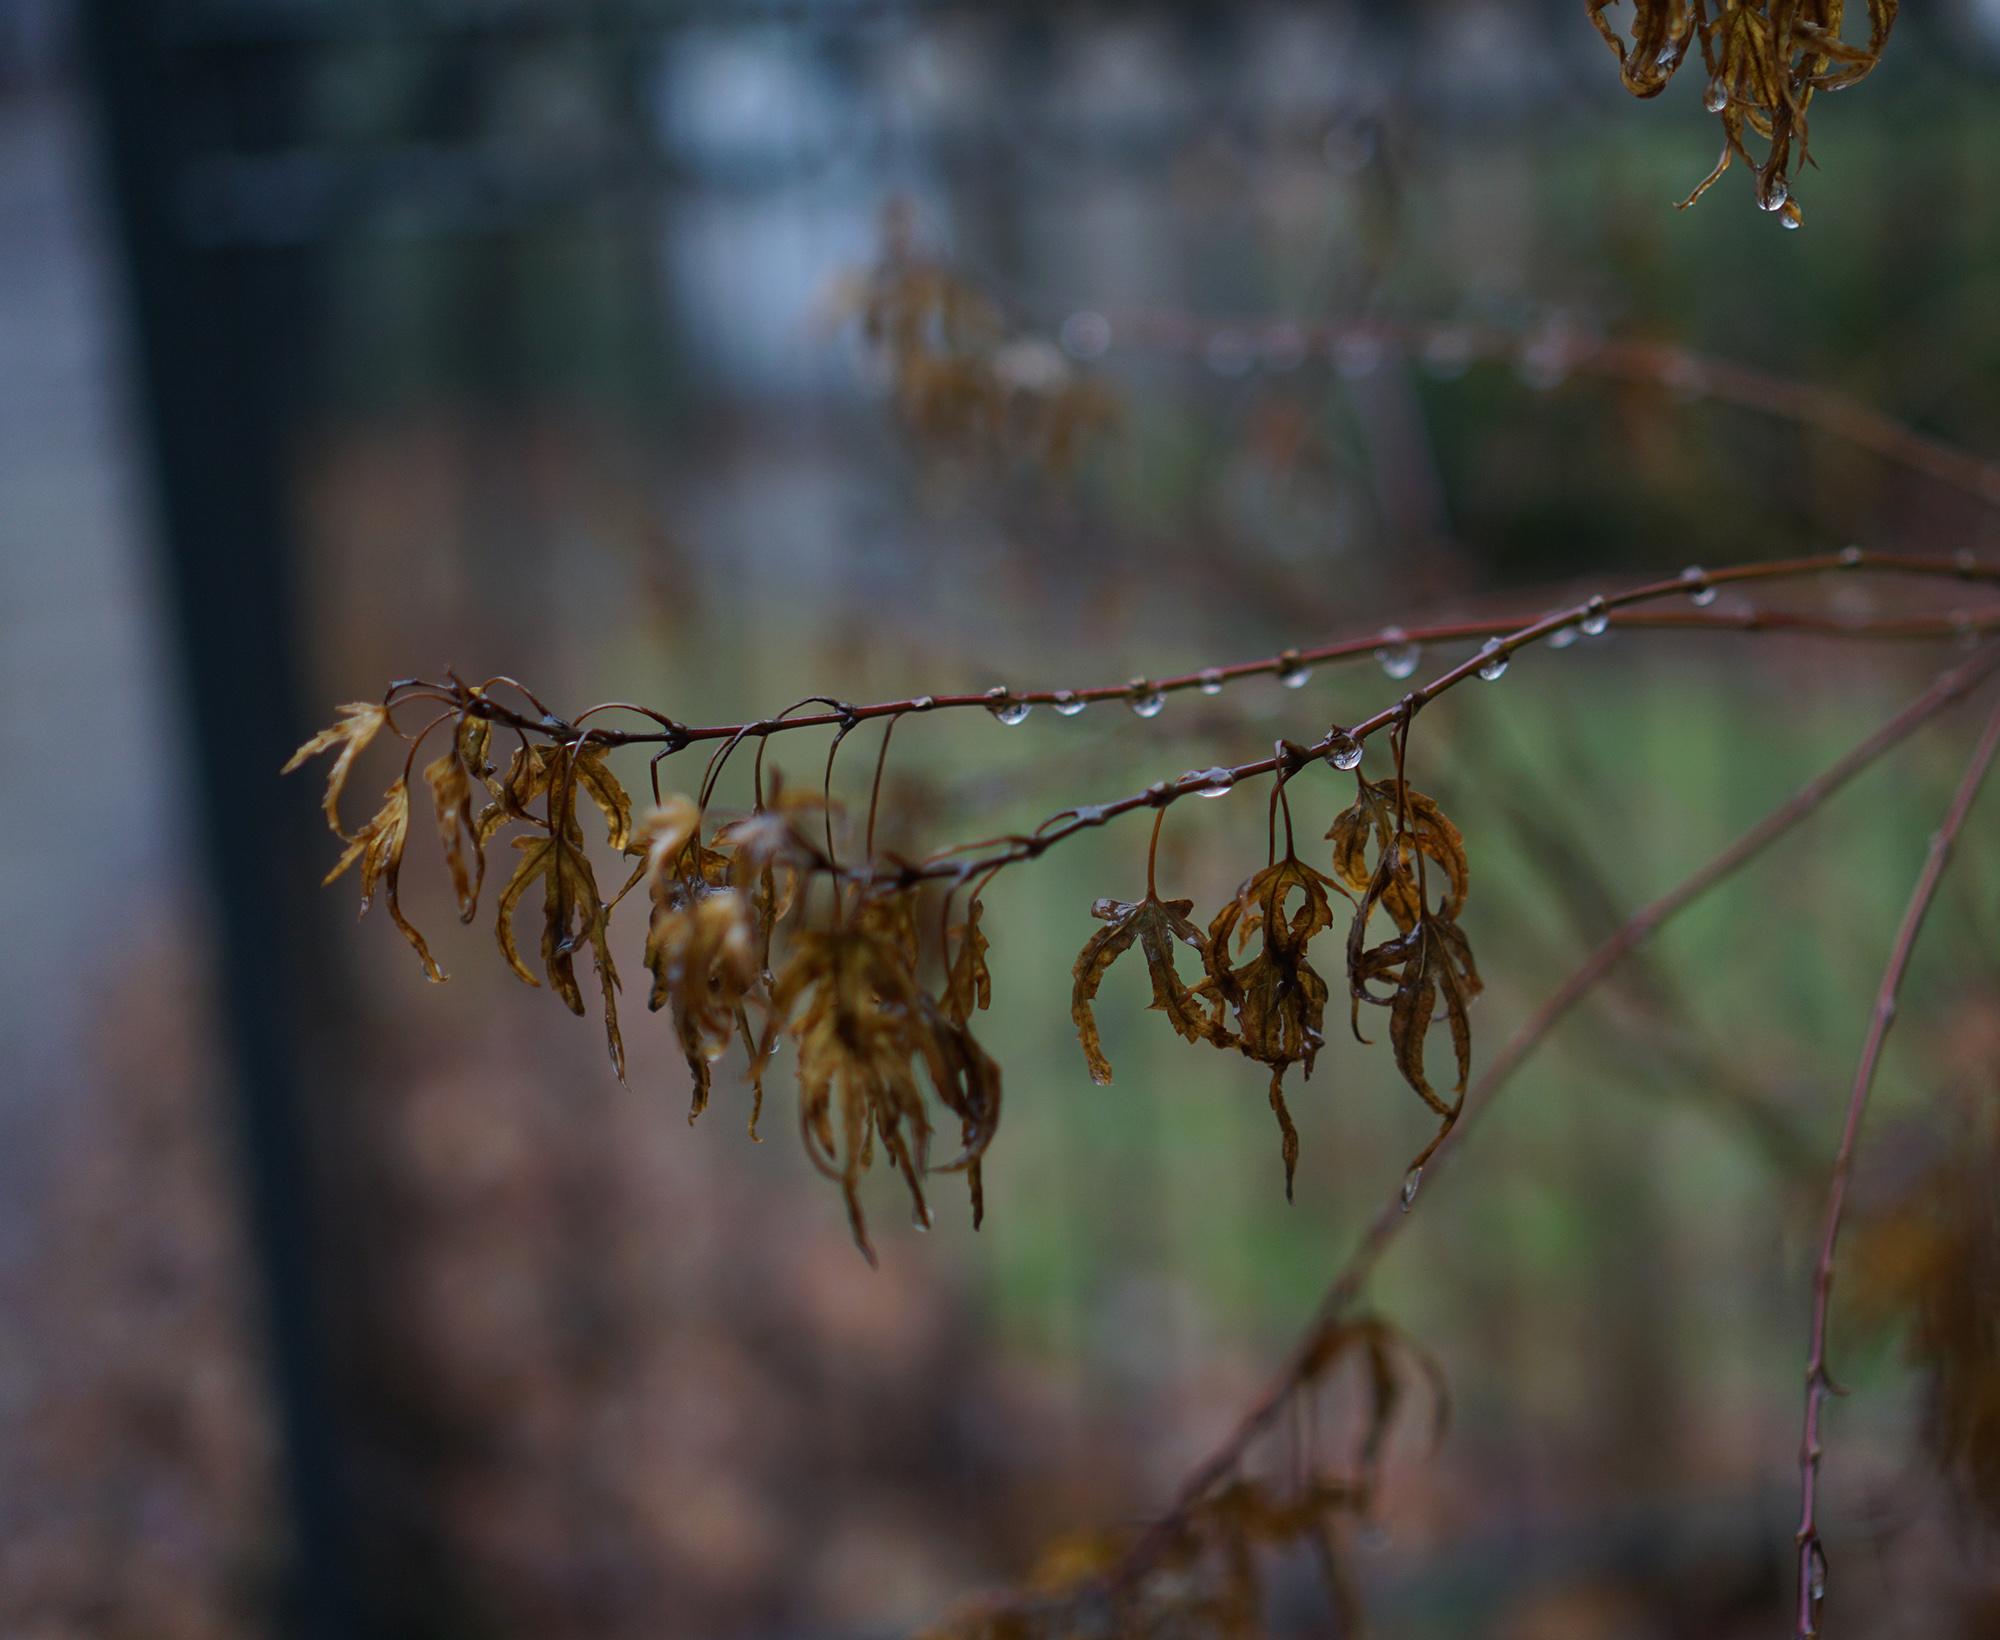 Plant in the rain, Chicago / Darker than Green